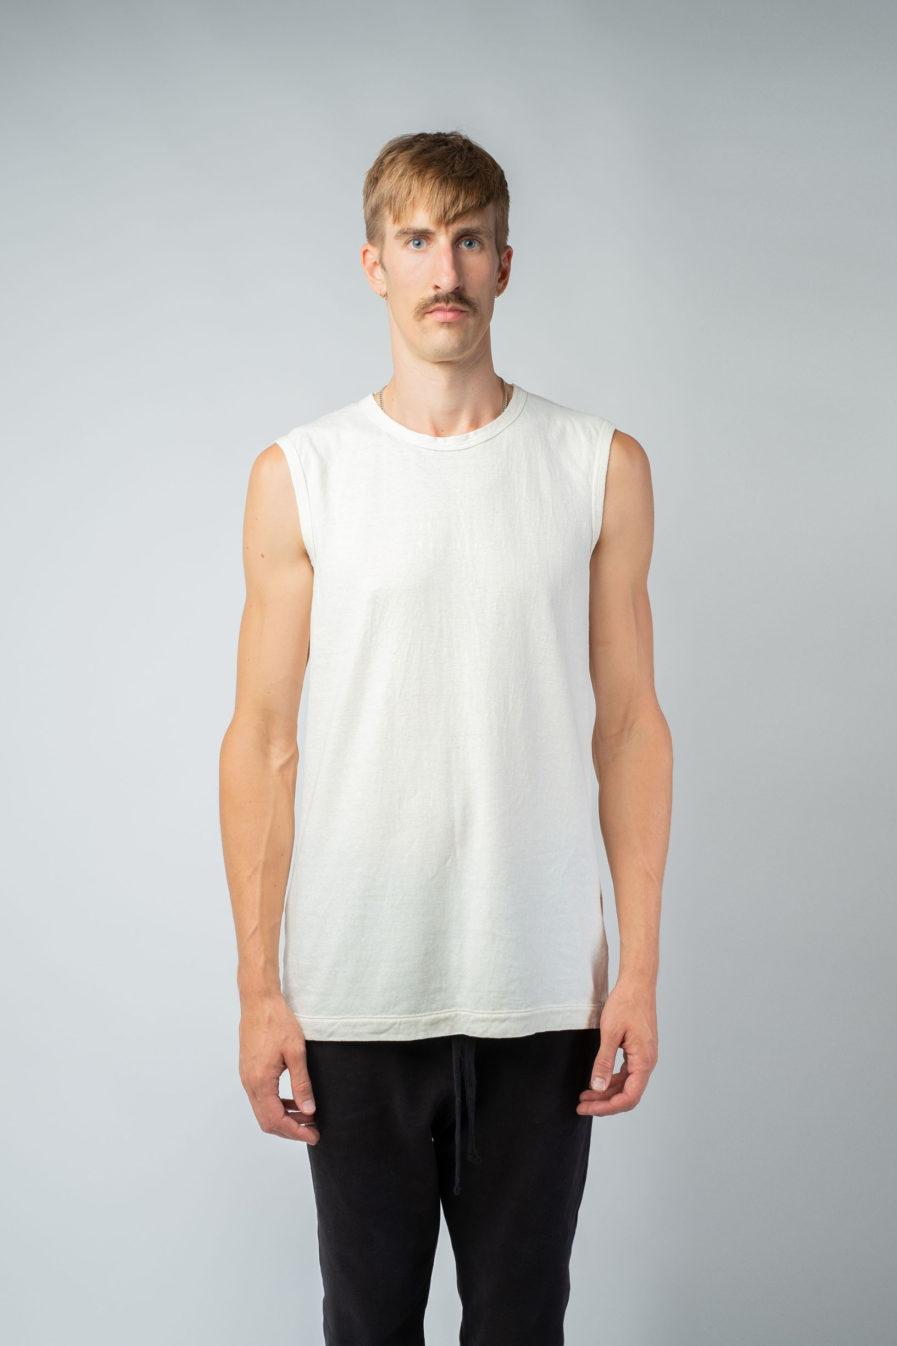 MAN unisex singlet tanktop hemp organic cotton VALENTIJN Blank canvas front